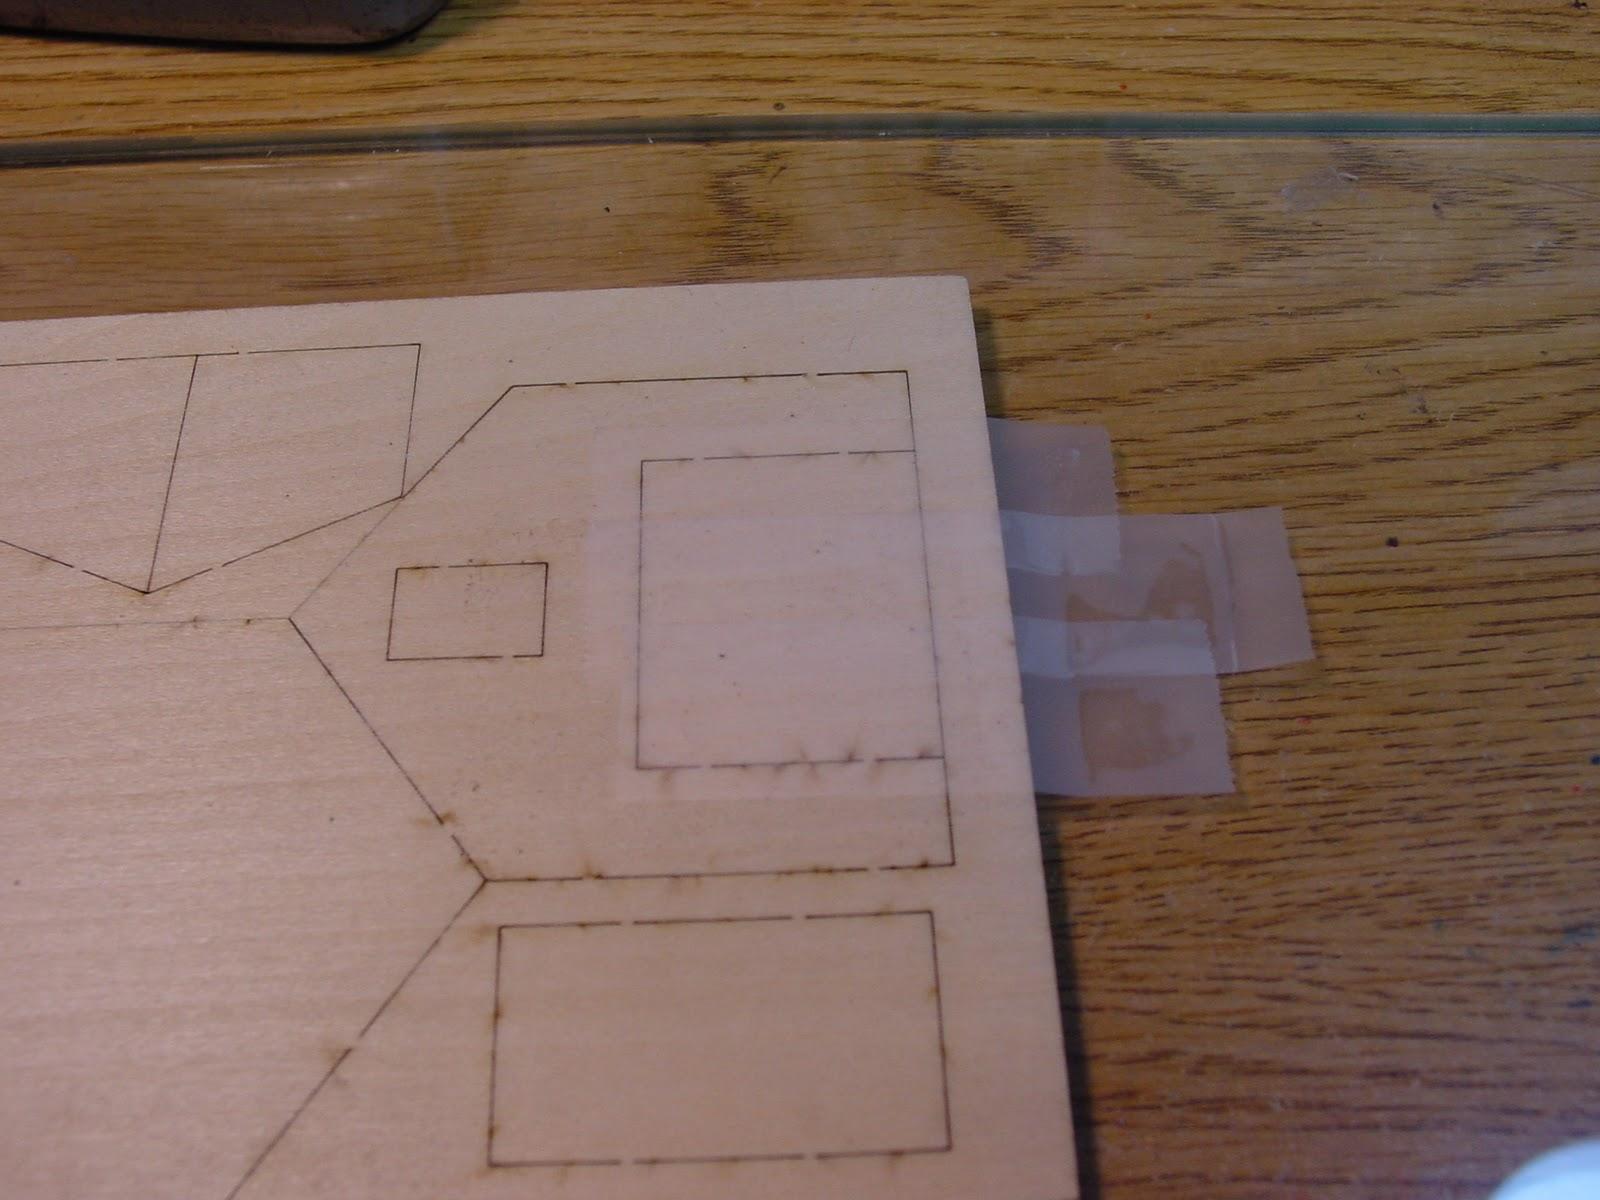 The model railroader 39 s notebook your first laser kit 03 basic barn kit painting the barn inside for Overlapping interior barn doors